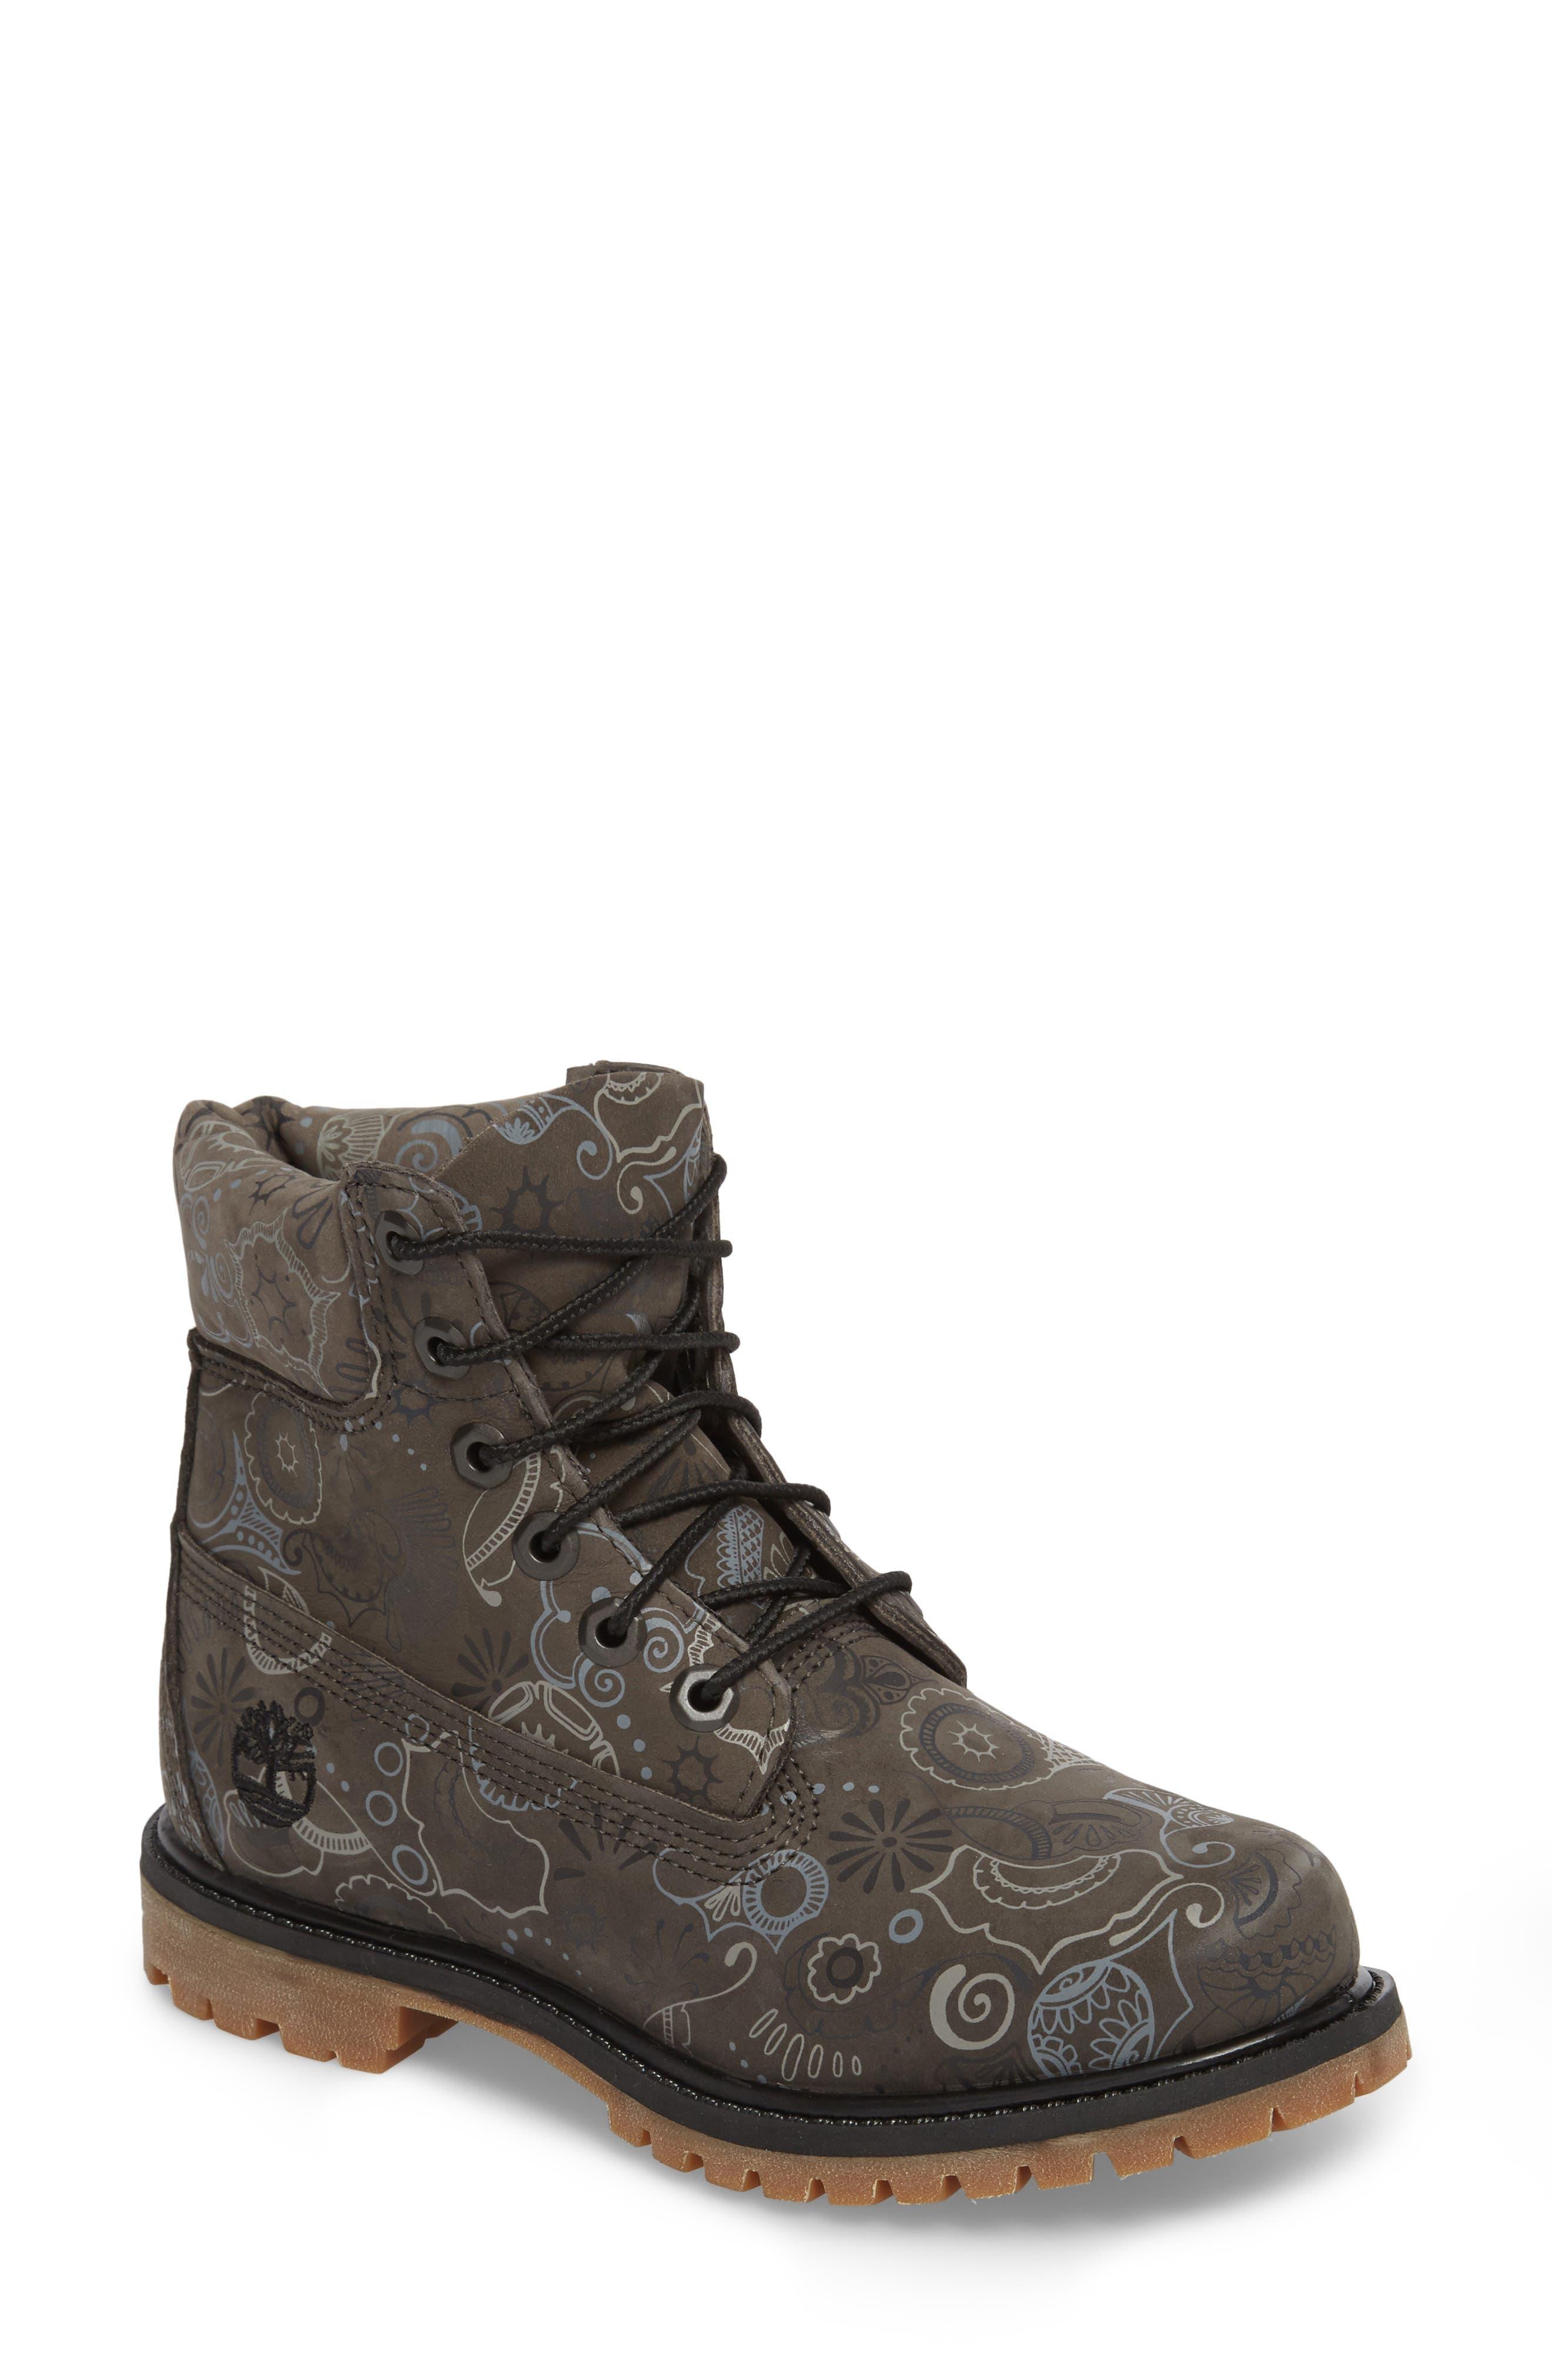 Henna Premium Boot,                             Main thumbnail 1, color,                             065